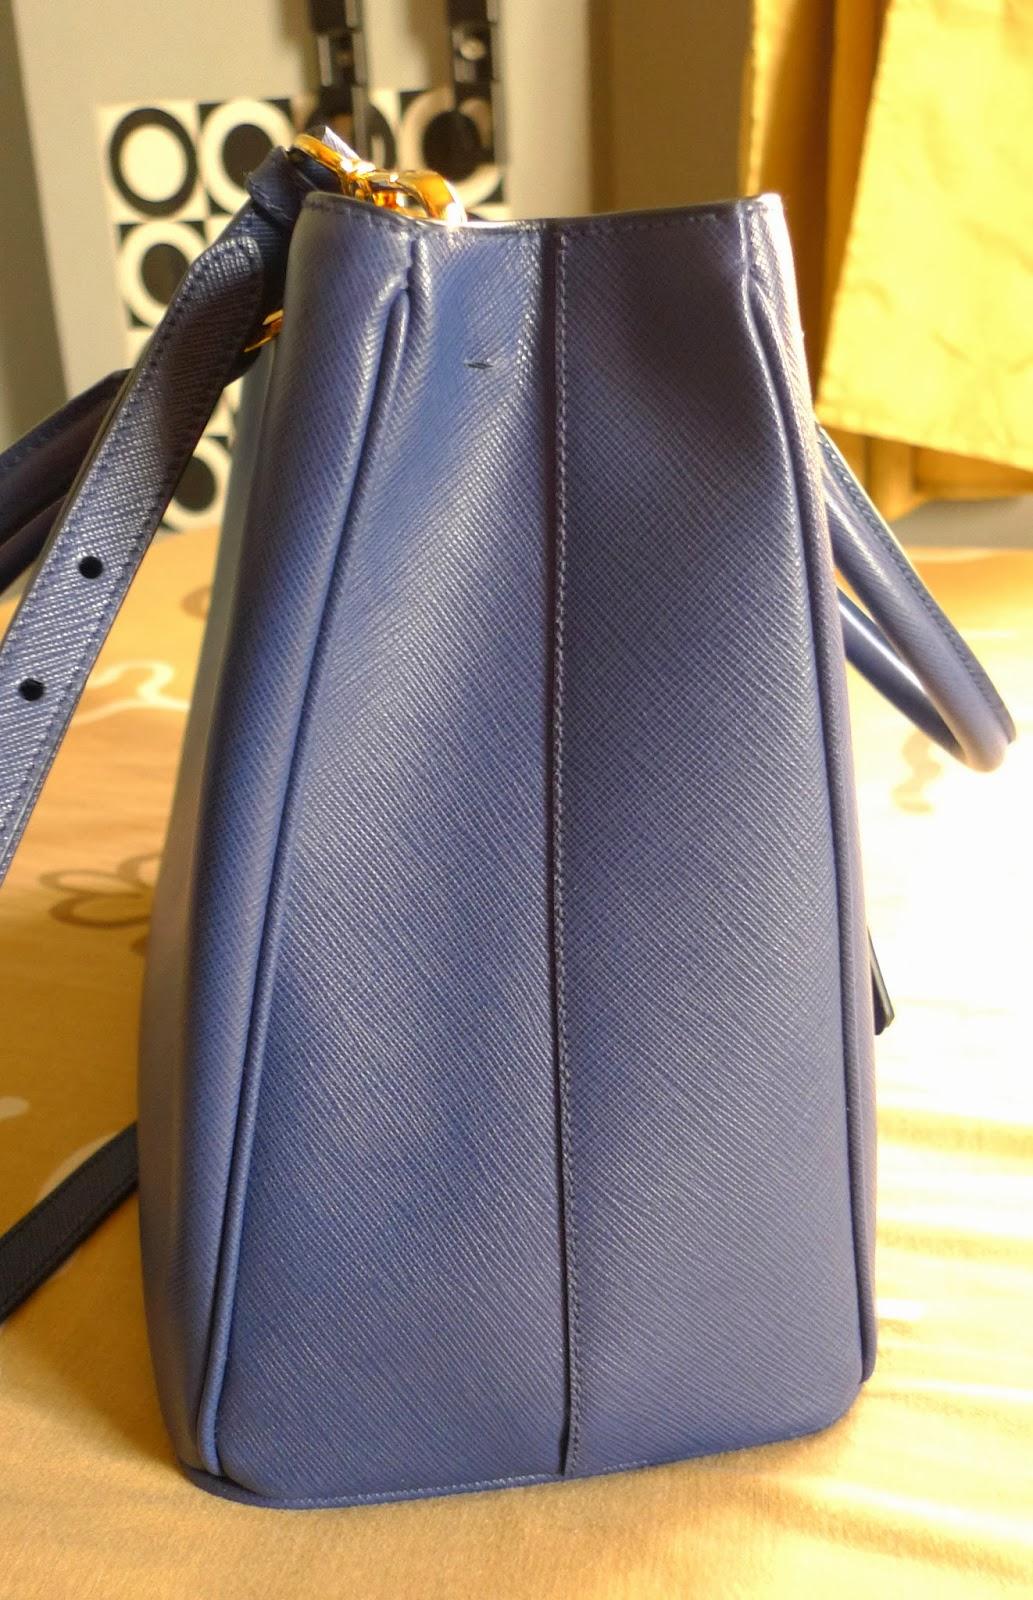 saffiano lux tote prada price - Prada Lux Saffiano BN1874 Review + Authenticate your Prada Lux ...